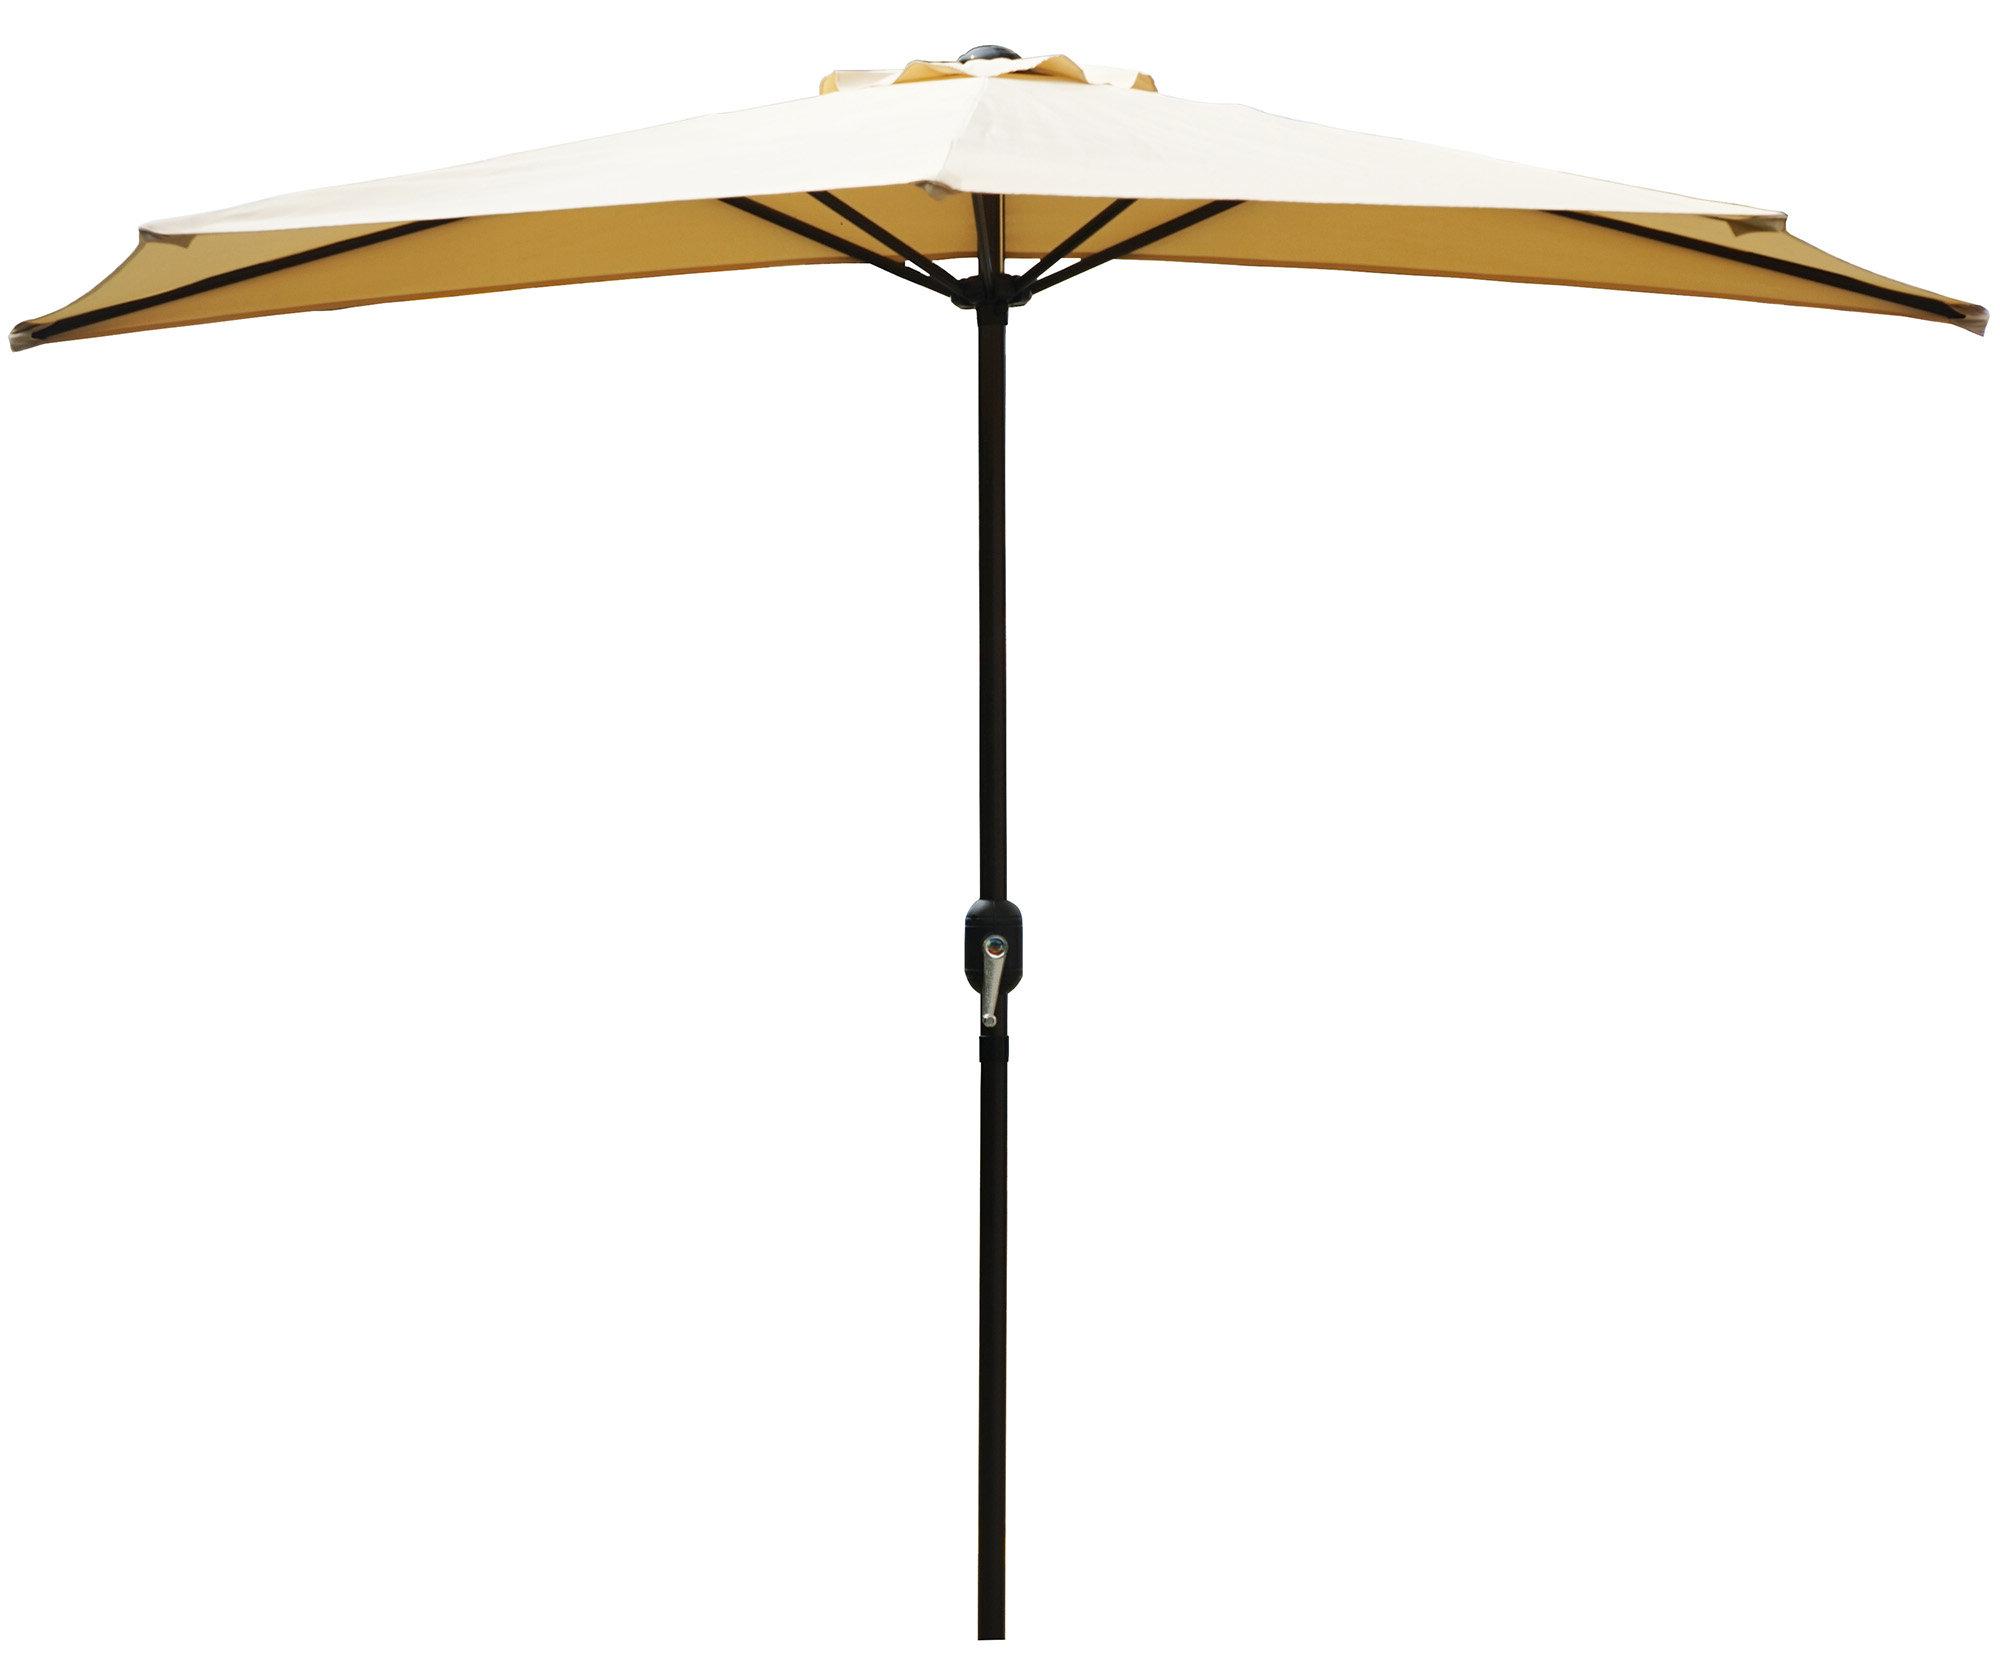 Favorite Sheehan Market Umbrellas Inside Alder 9' Half Round Outdoor Patio Market Umbrella (View 3 of 20)